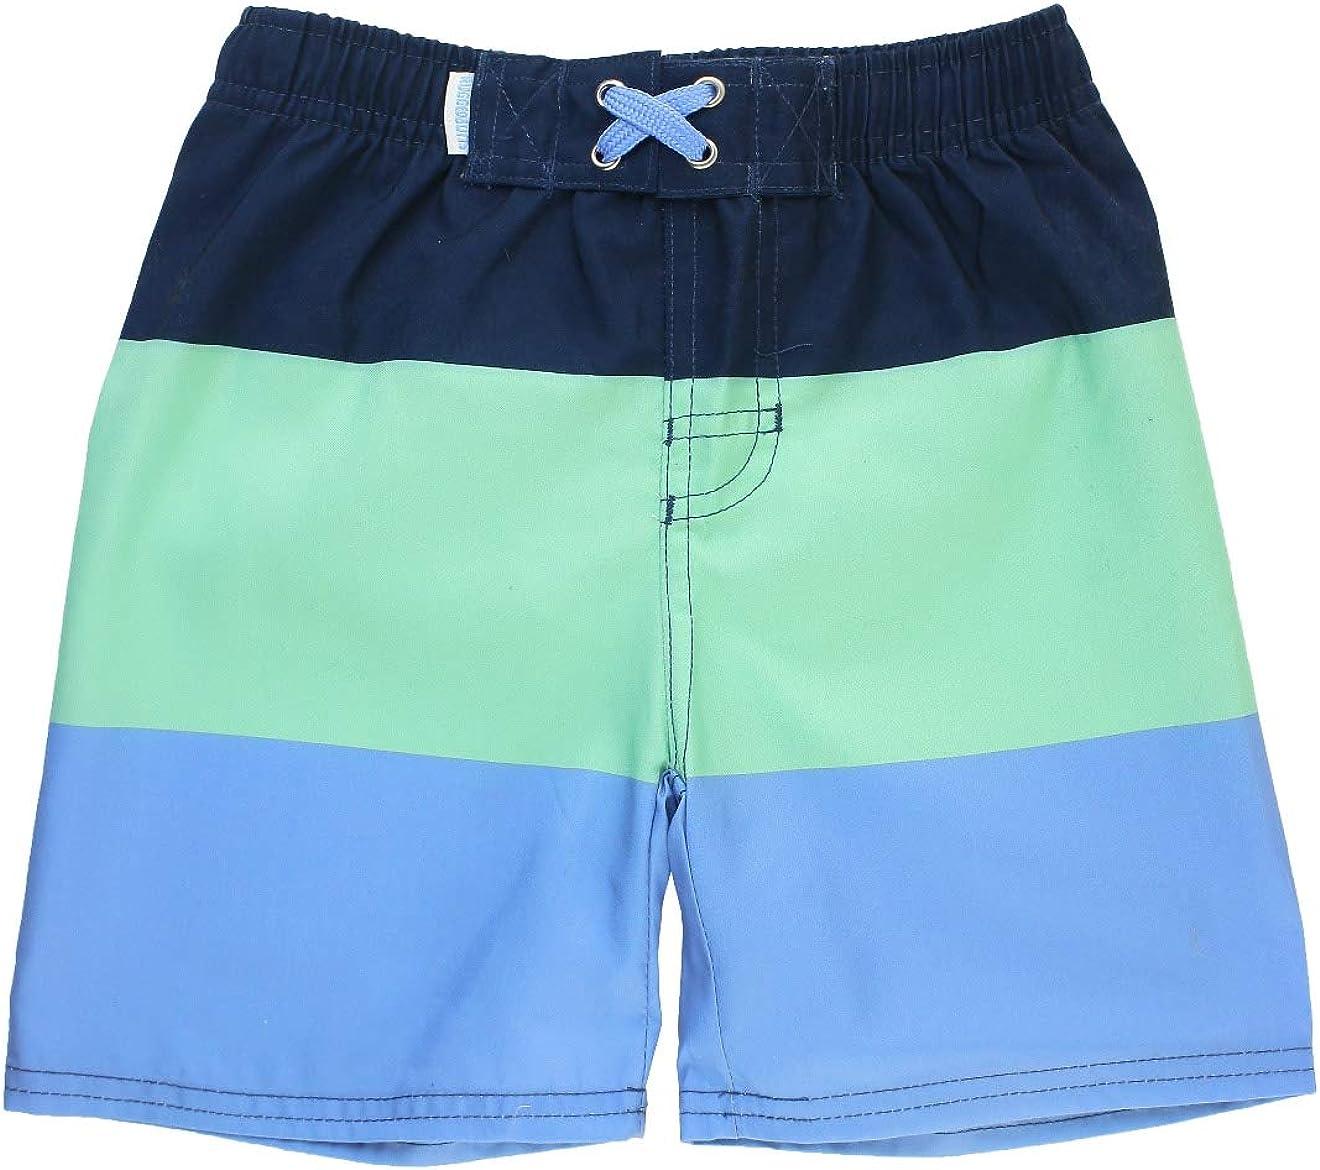 RuggedButts Little Boys Mint /& Blue Color Block Swim Trunks